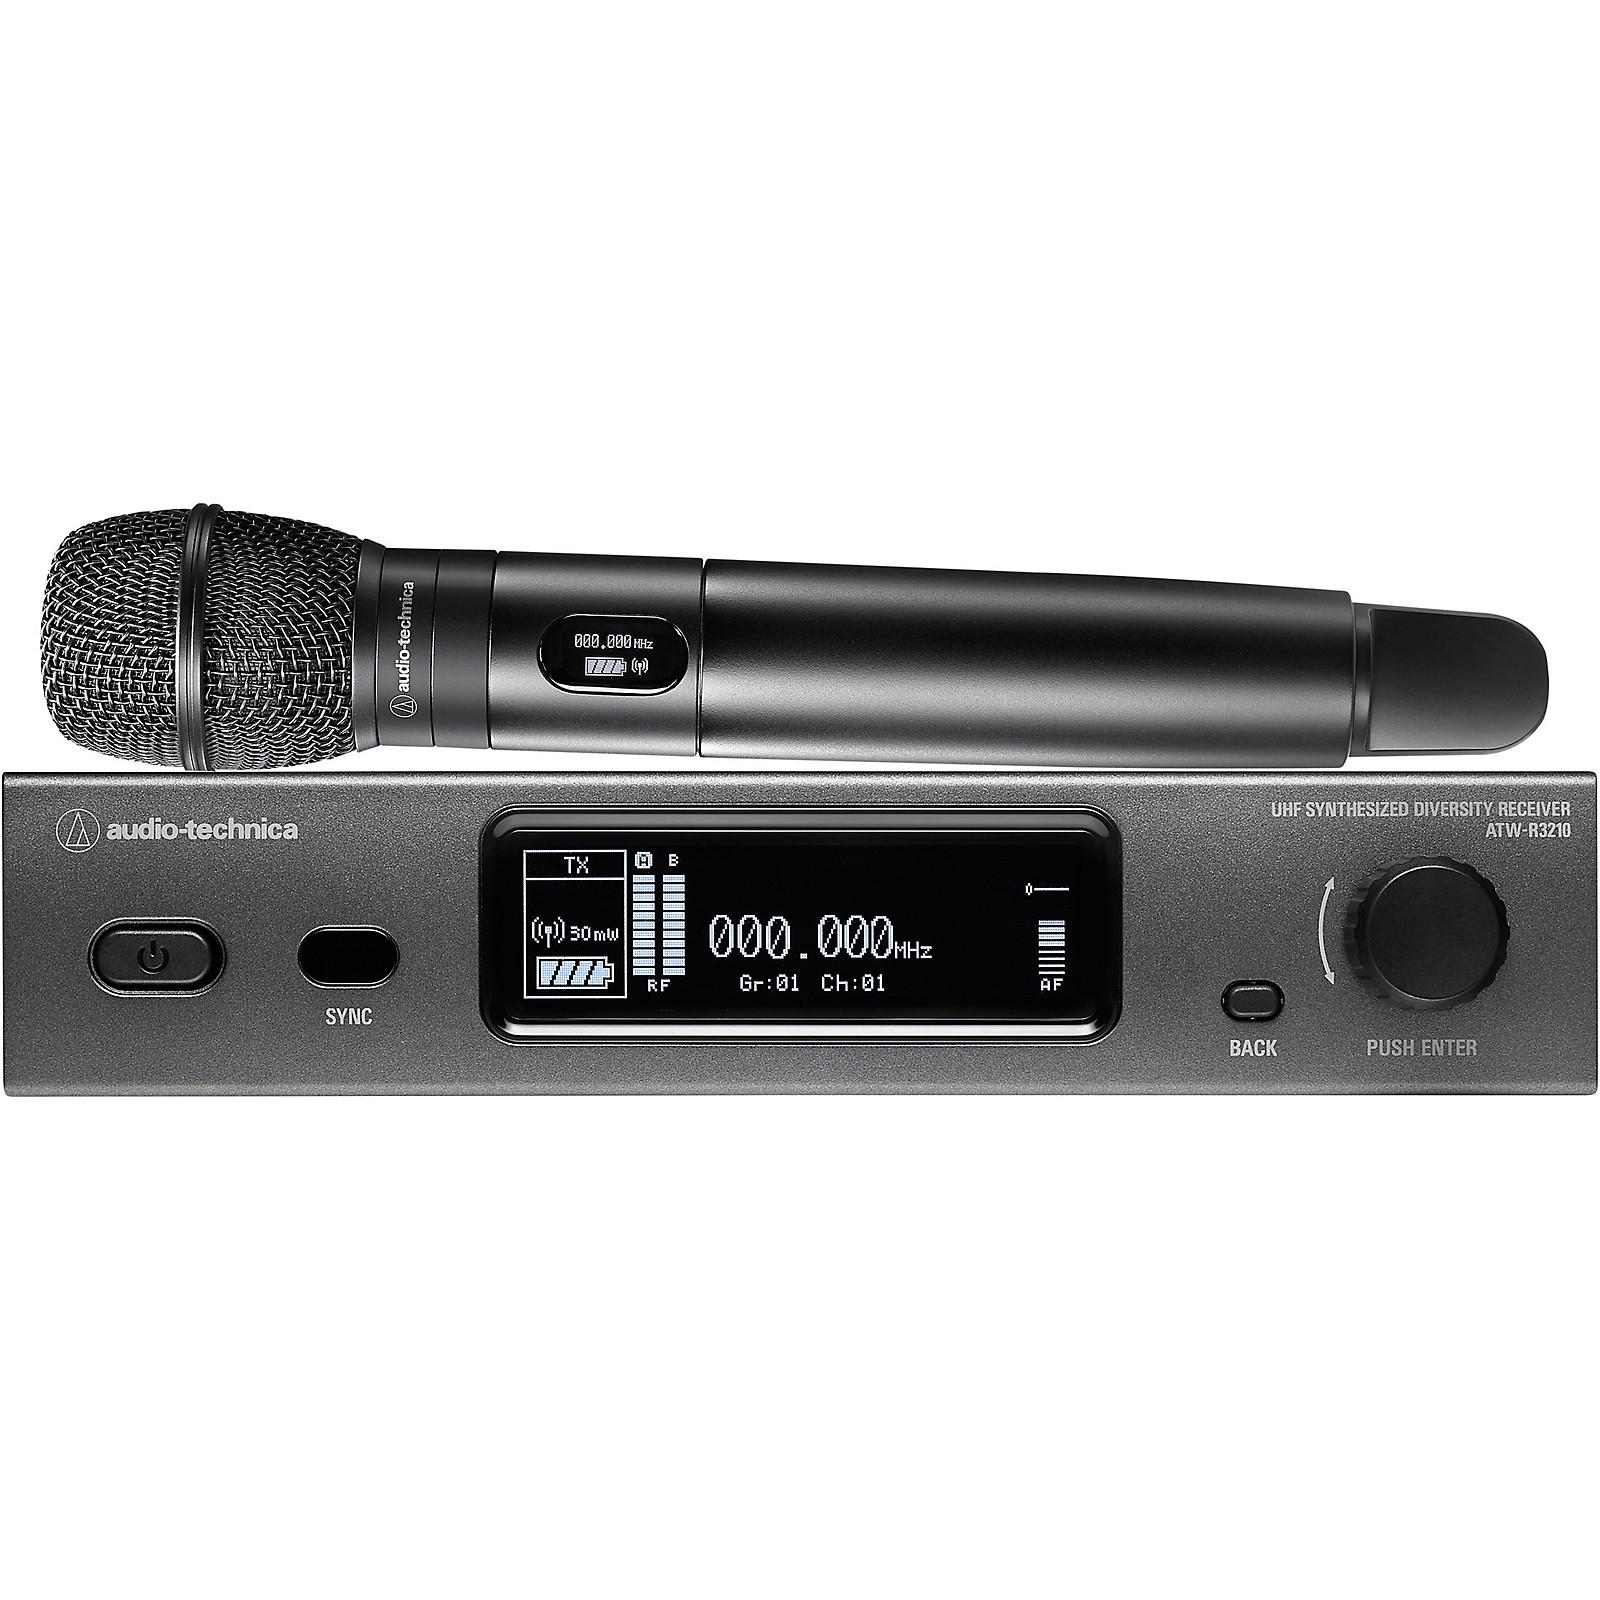 Audio-Technica Audio-Technica ATW-3212/C710 3000 Series Frequency-agile True Diversity UHF Wireless Systems